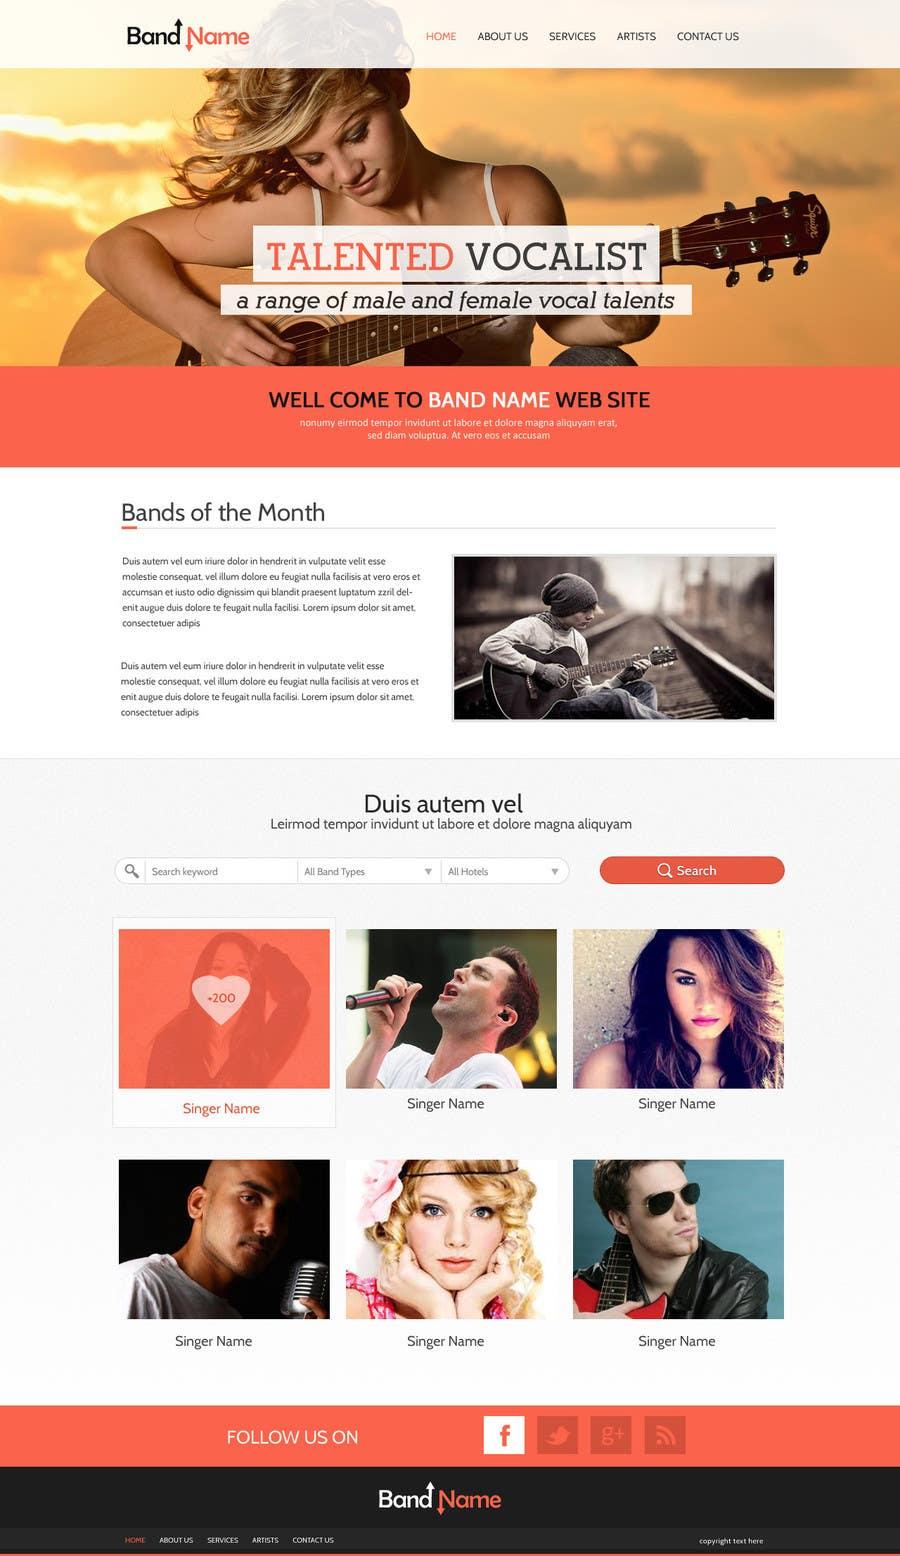 Bài tham dự cuộc thi #                                        11                                      cho                                         Design a Website for Music Band introduction site